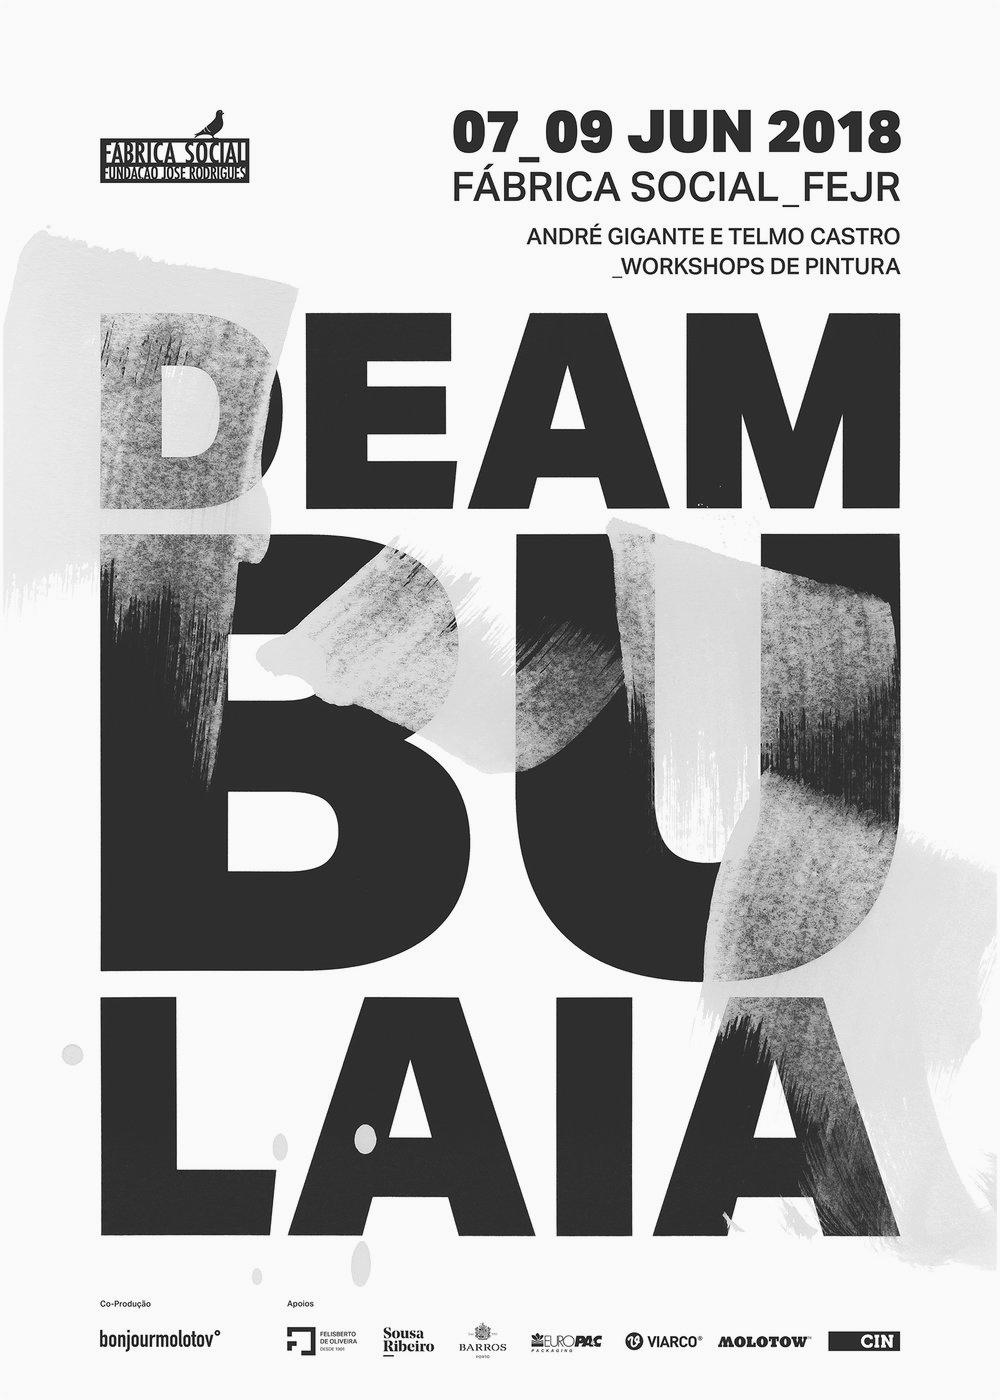 Deambulaia+Workshop+Andre+Gigante+Telmo+Castro+bonjourmolotov.jpg